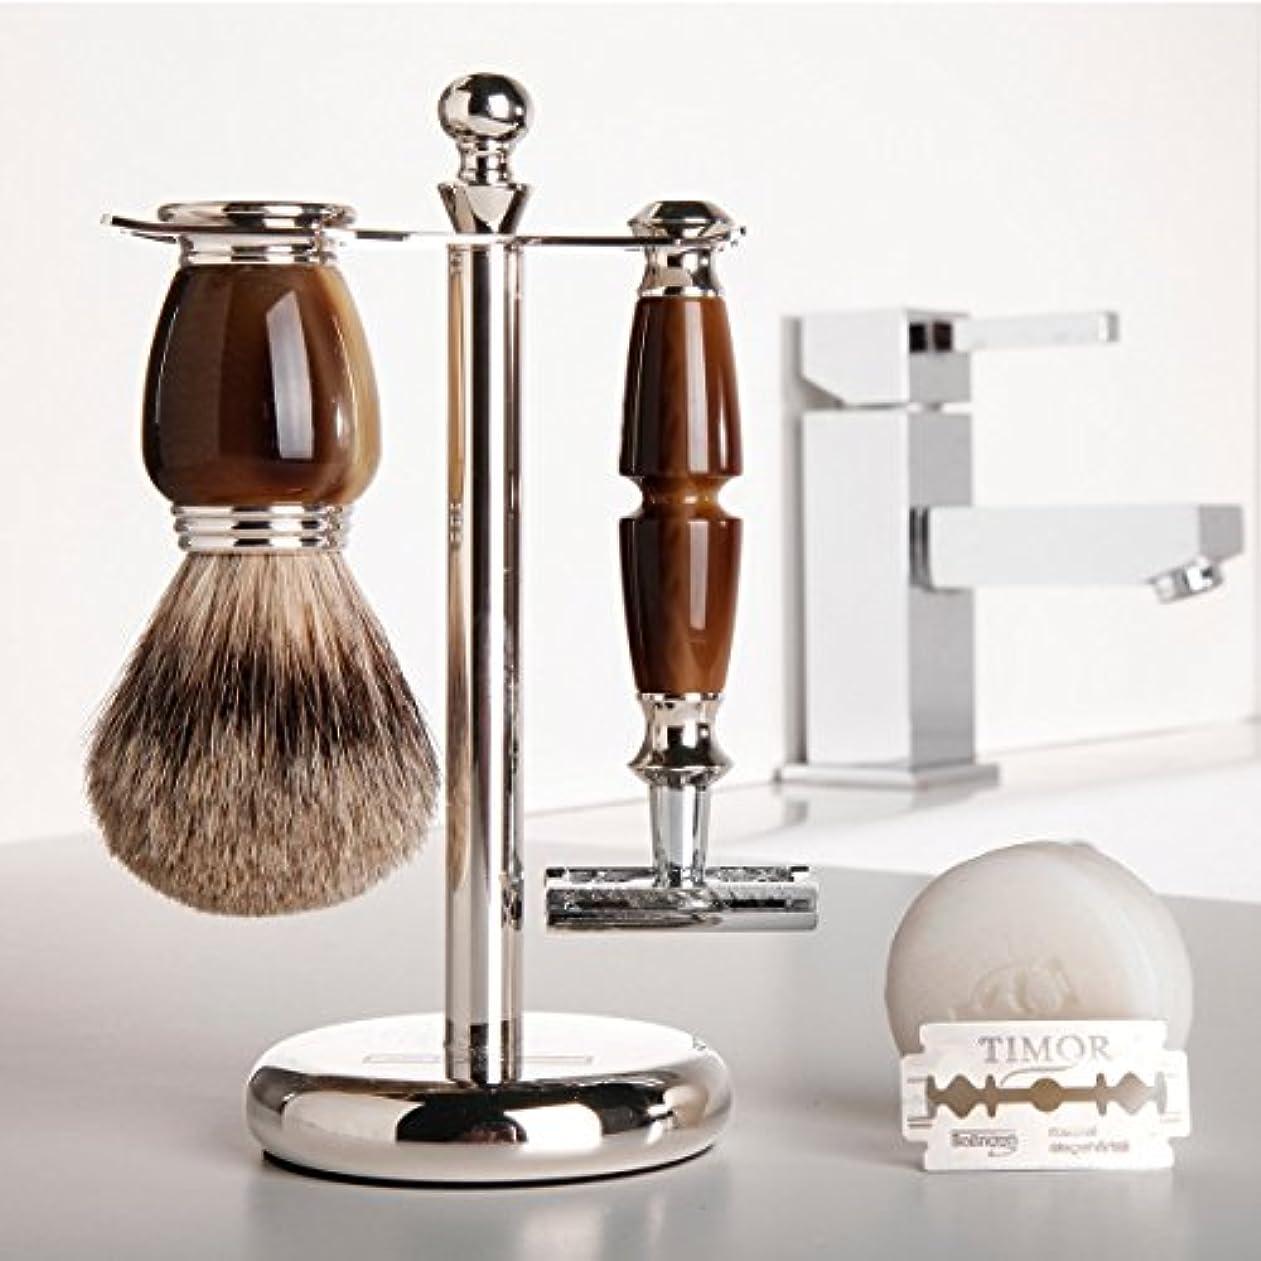 GOLDDACHS Shaving Set, Safety Razor, Finest Badger, Galalith